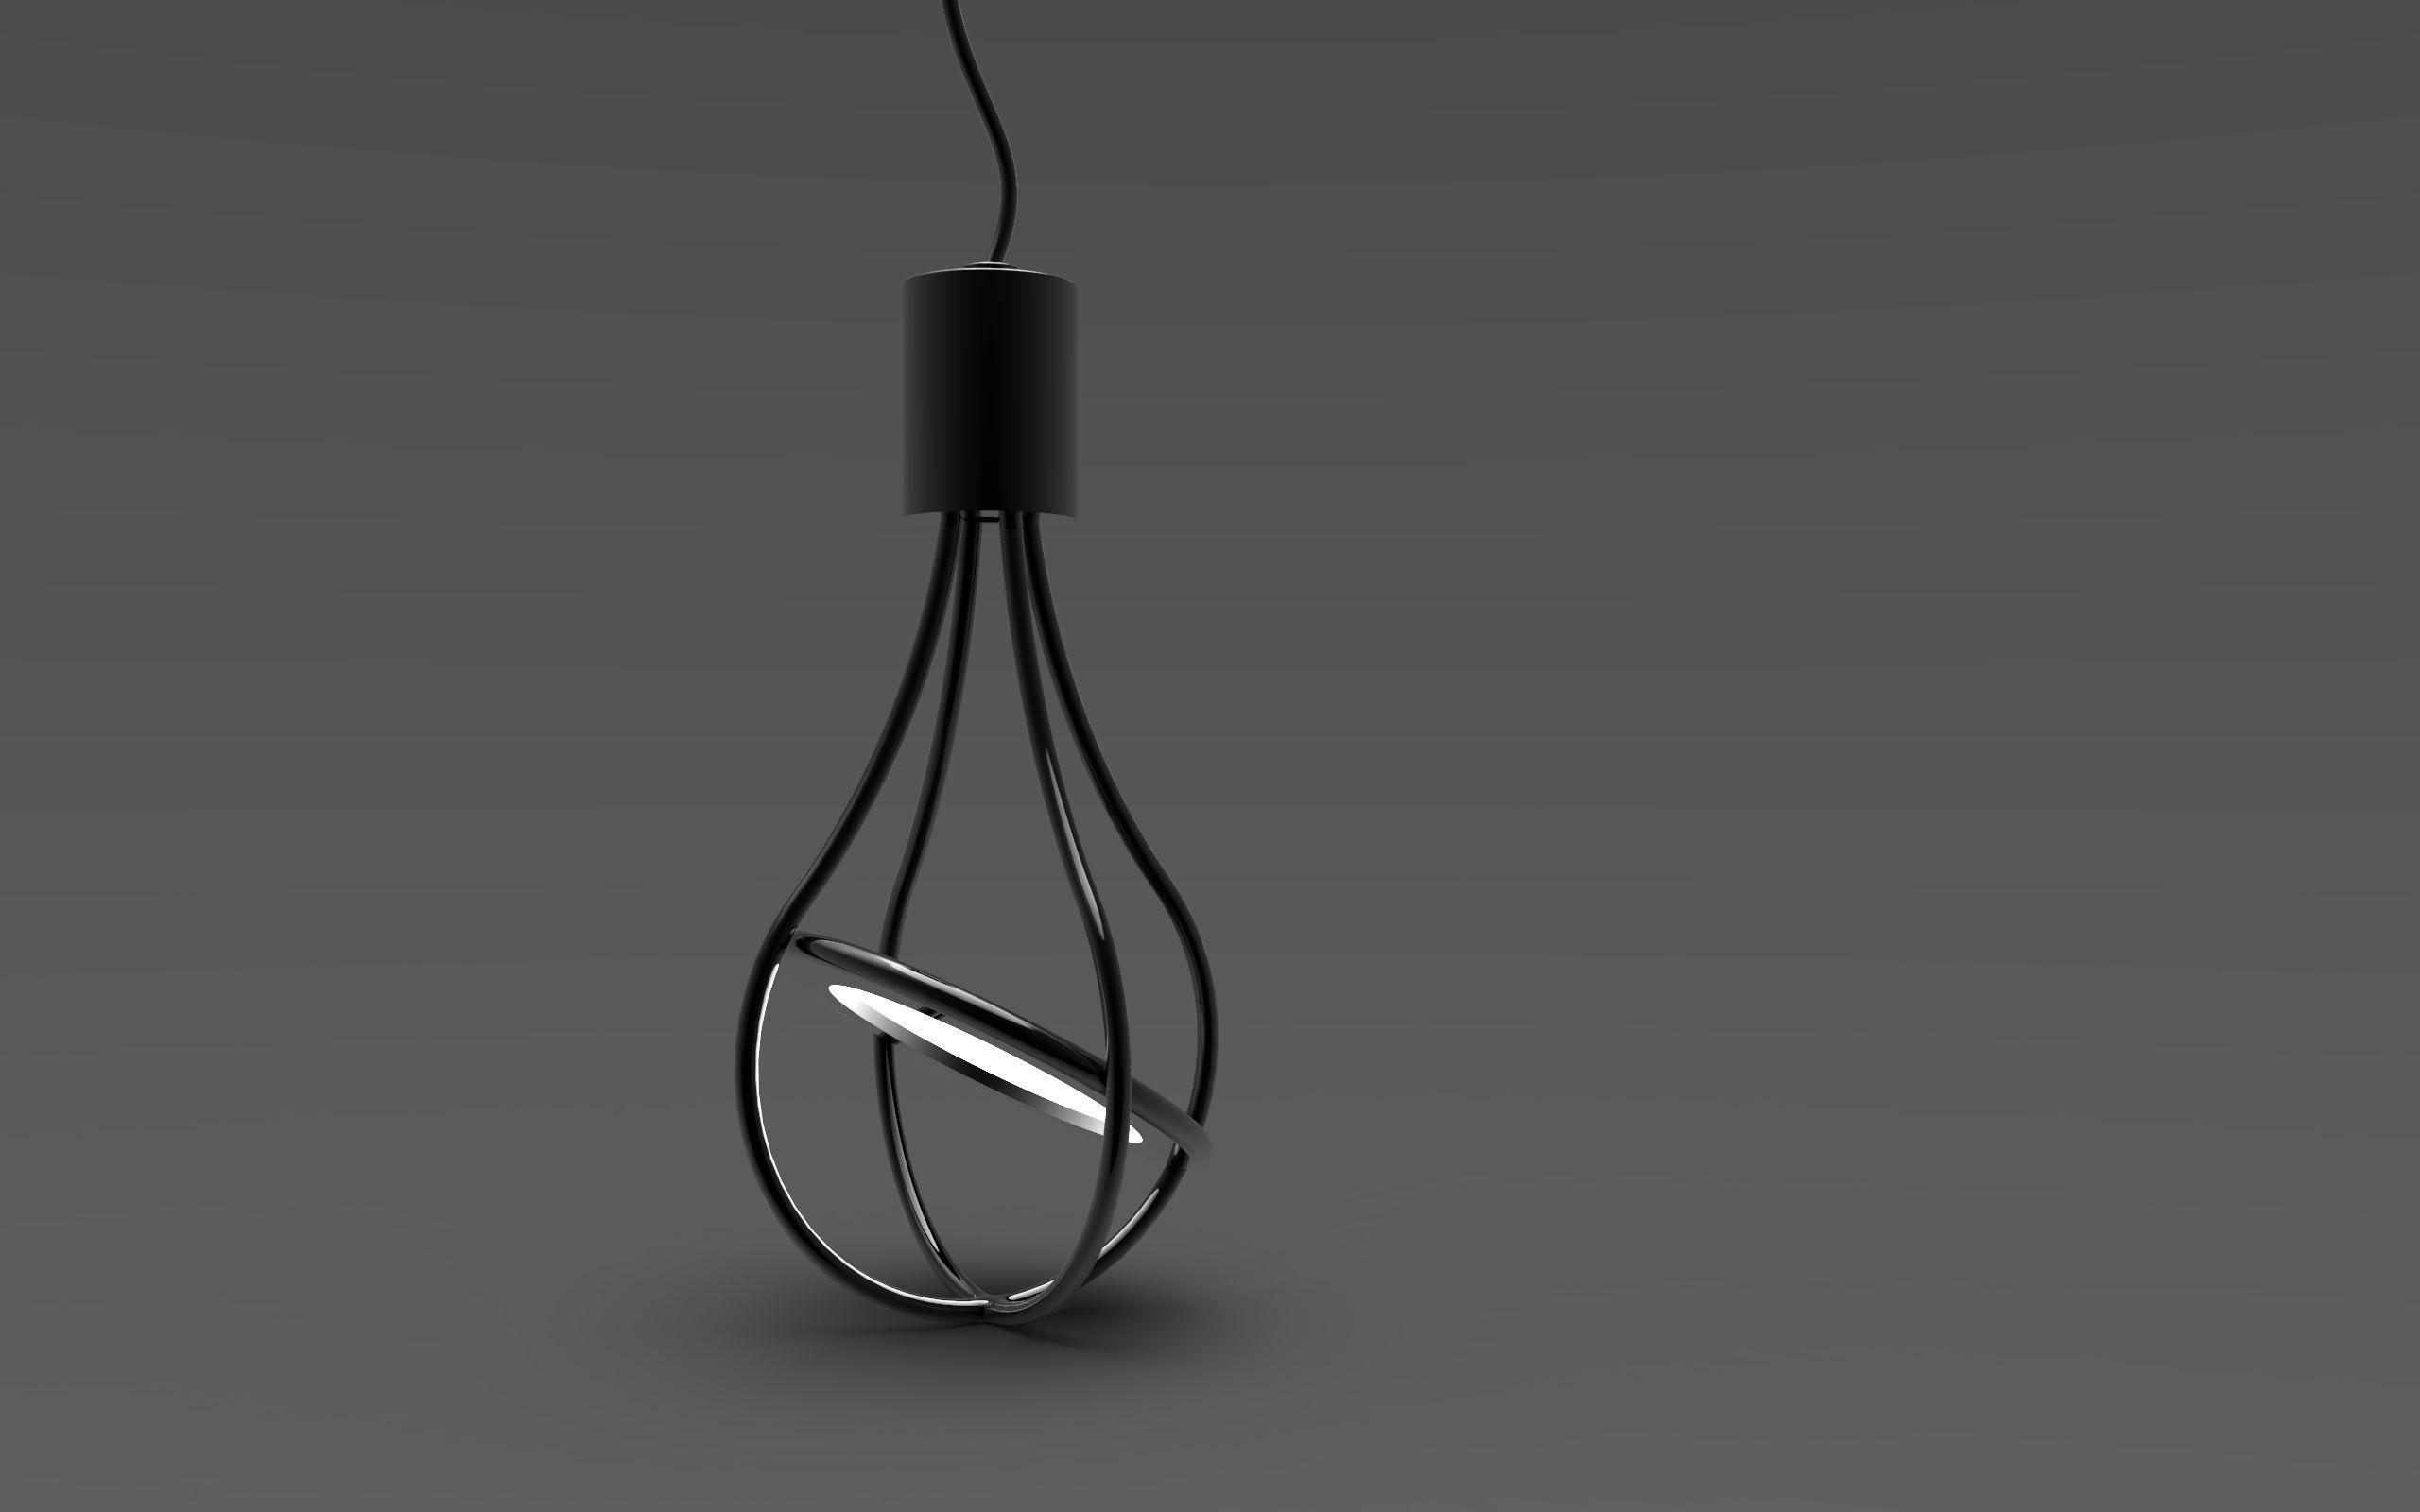 Lamp-l10f-pro5-3500-3500